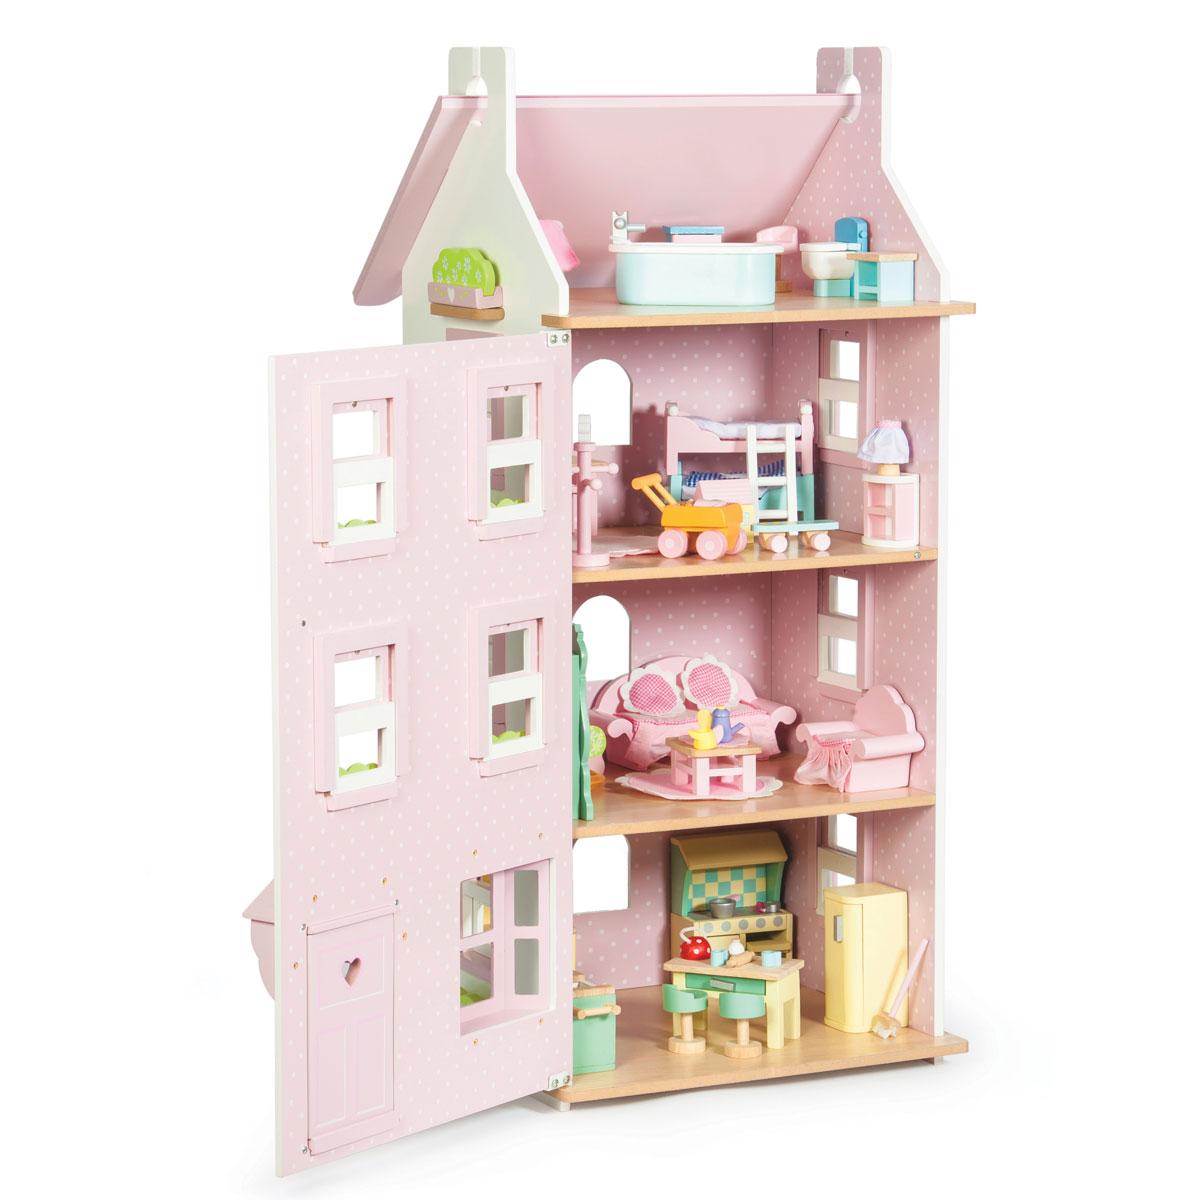 Le Toy Van Victoria Stadthaus